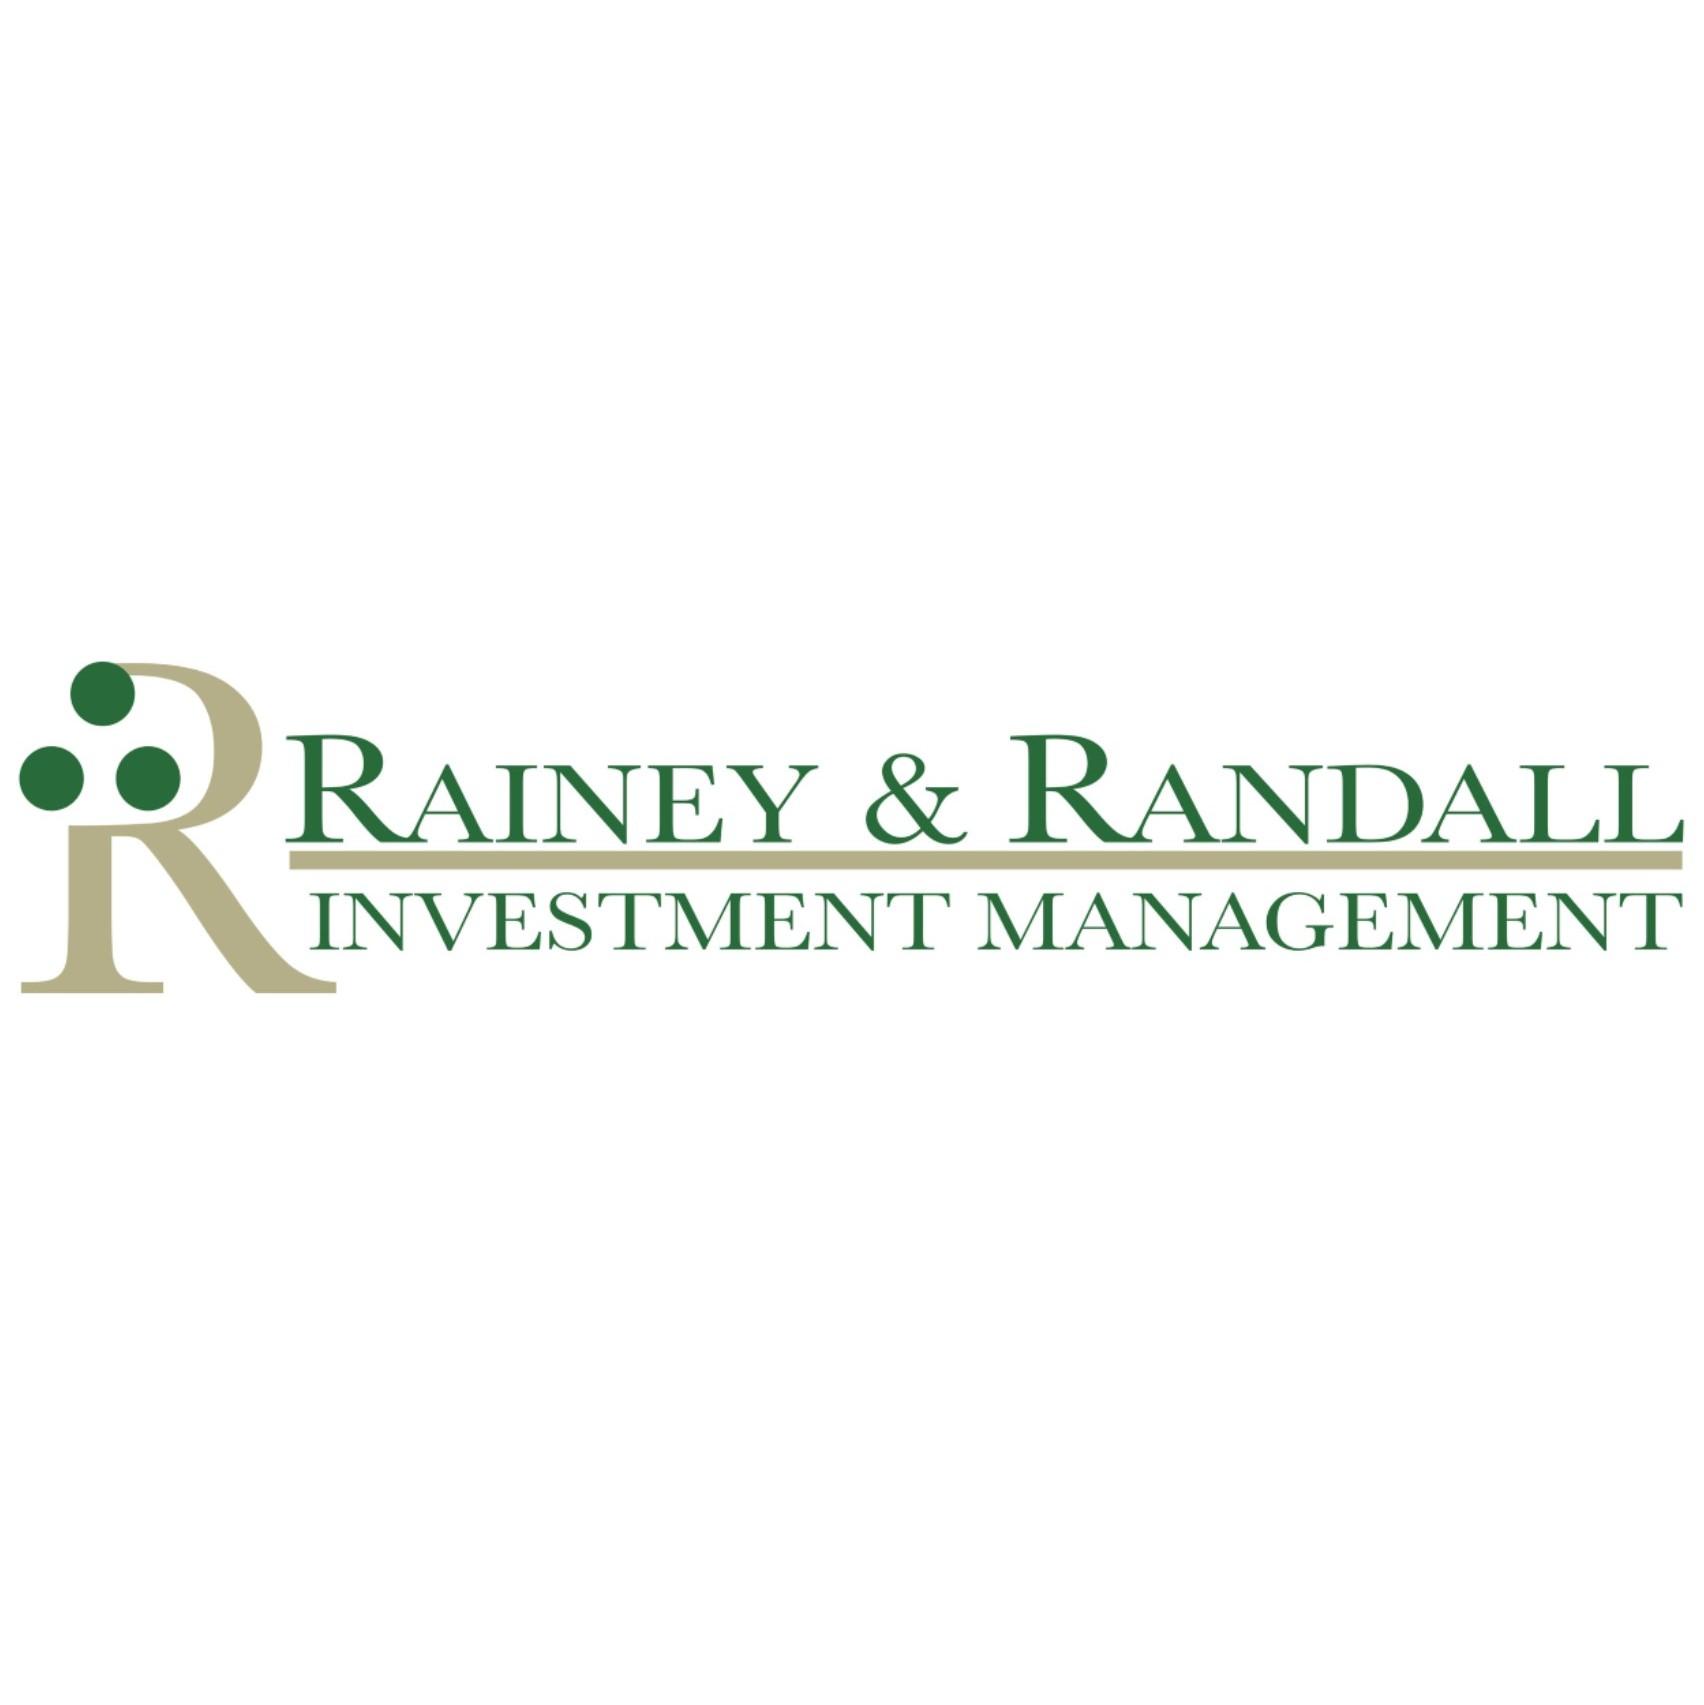 Rainey & Randall